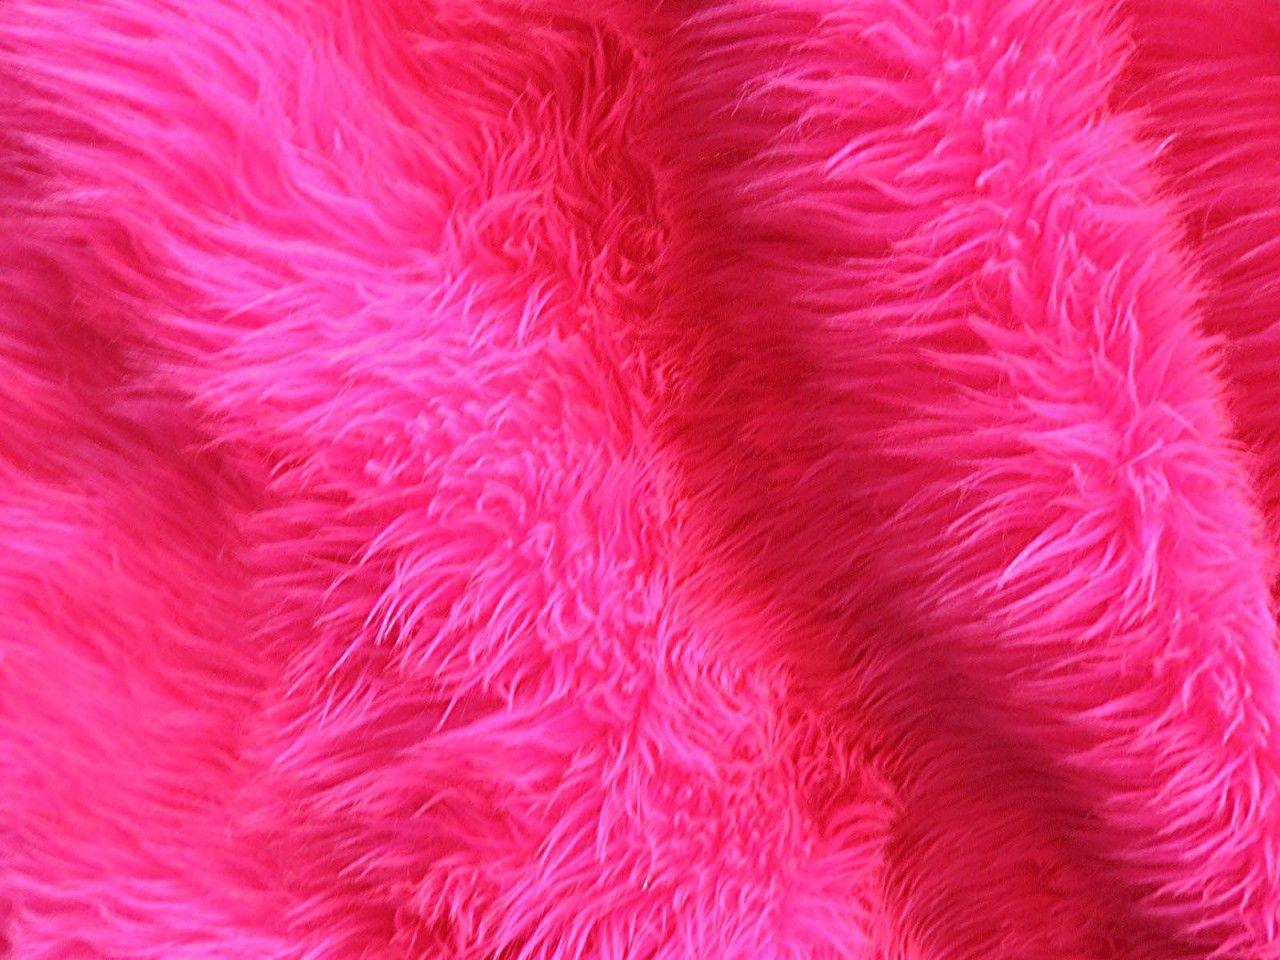 Hot Pink Shag Rug